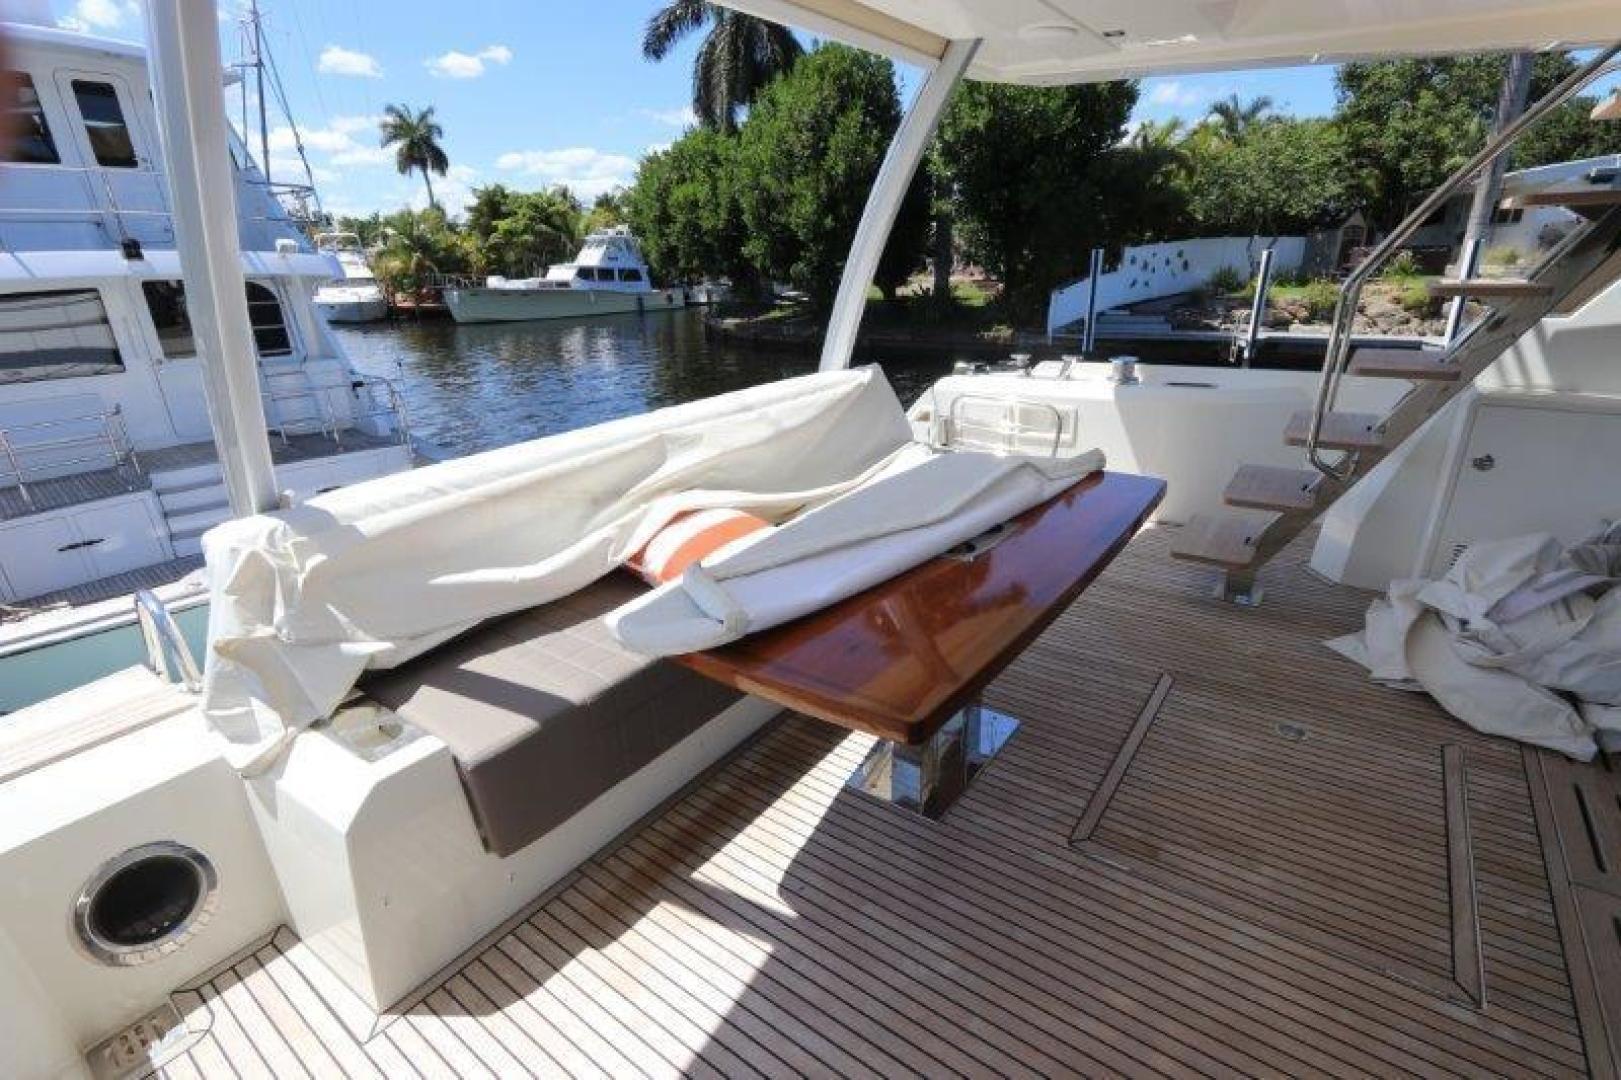 Prestige-Motoryacht 2017-Breathe Easy Fort Lauderdale-Florida-United States-1303846   Thumbnail